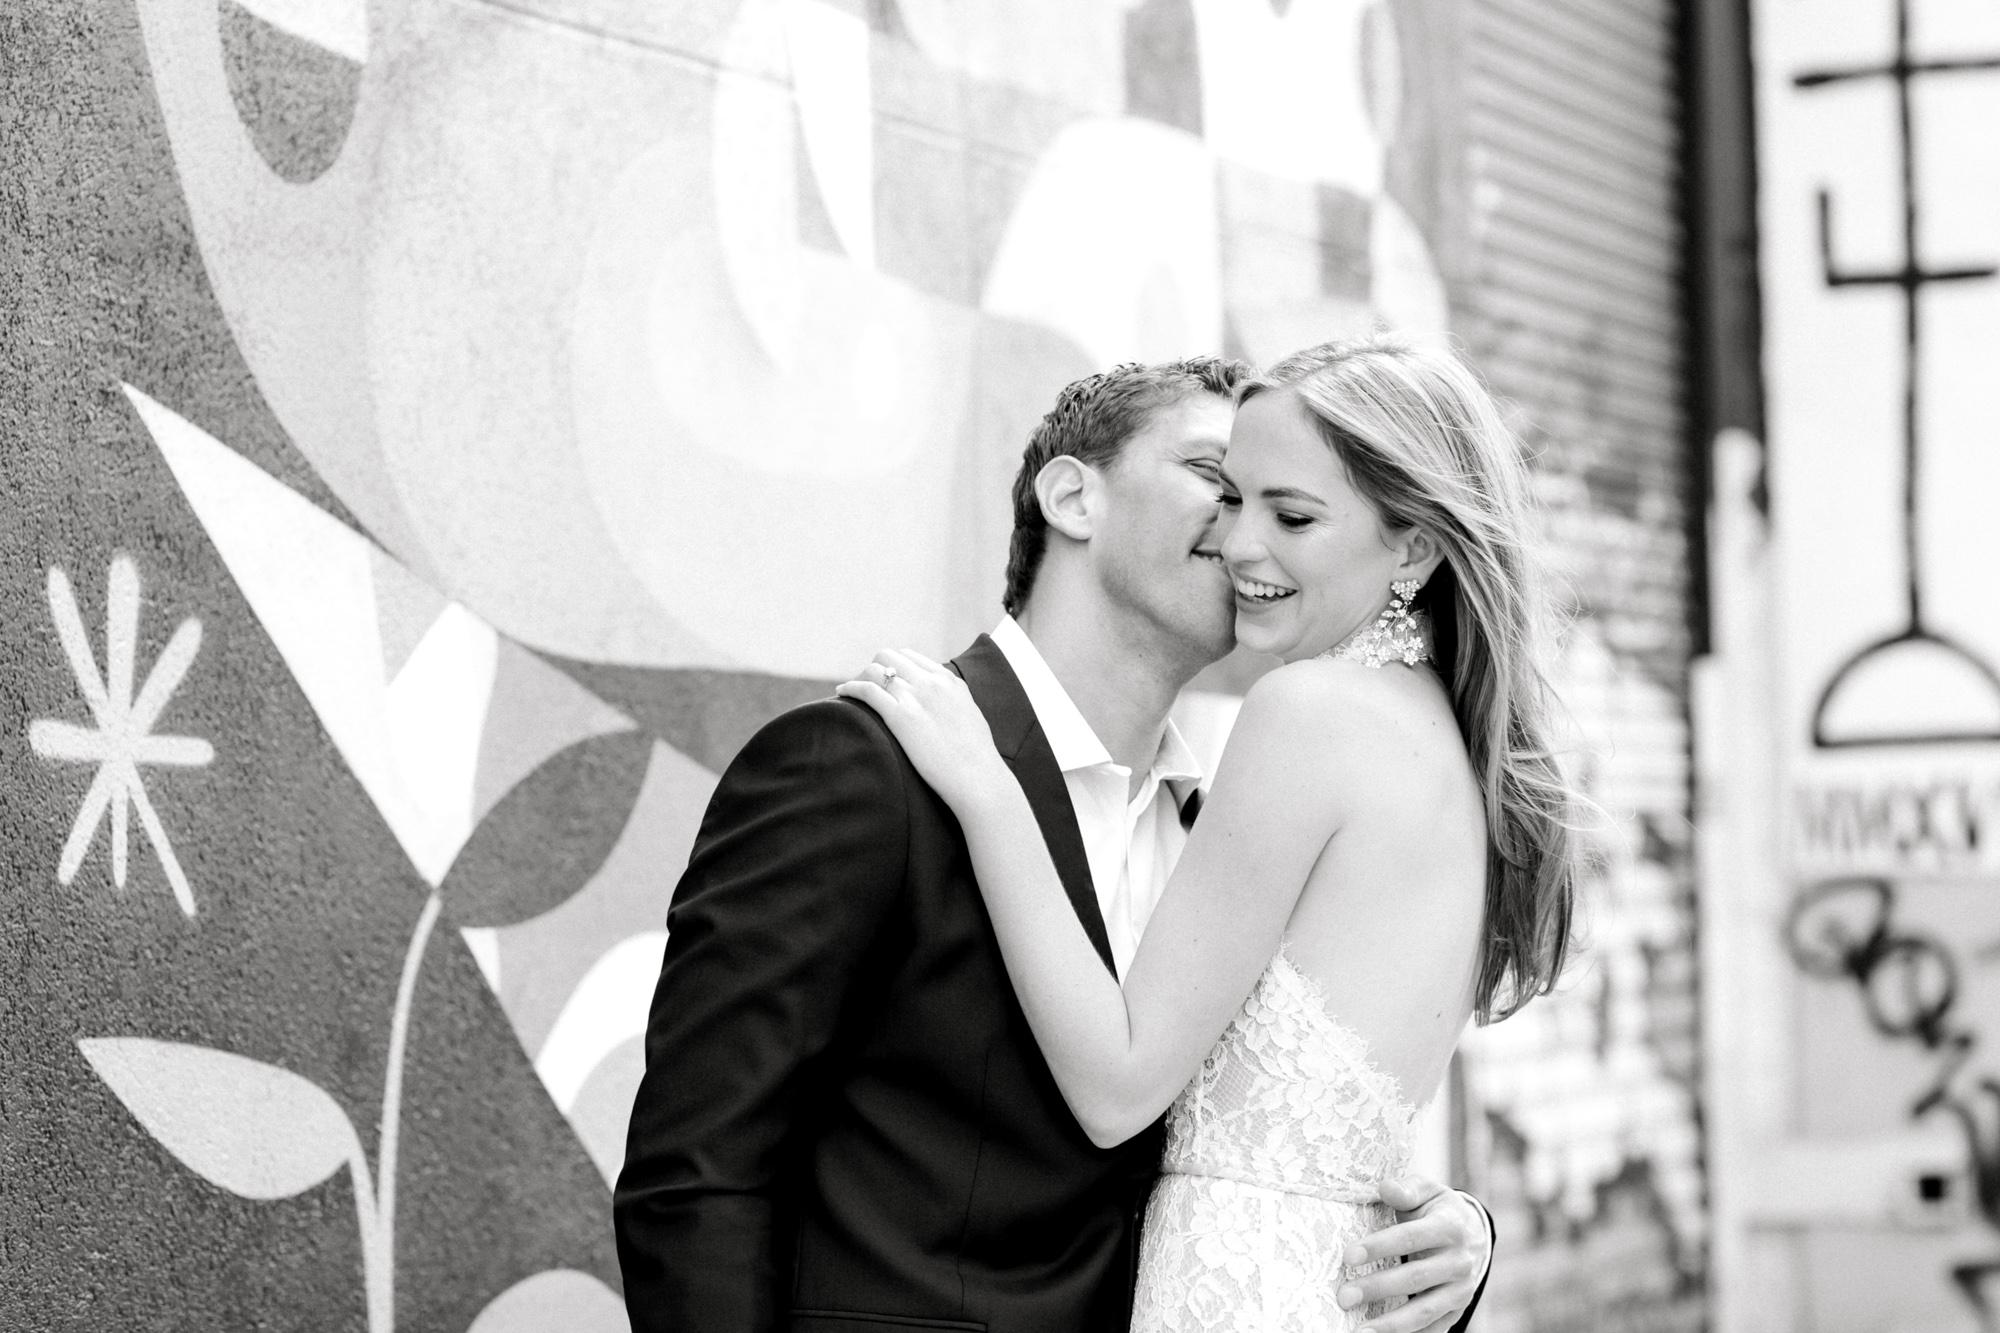 20_1896_Studio_Stages_Wedding_Brooklyn_Tanya_Salazar_Photography_002.jpg